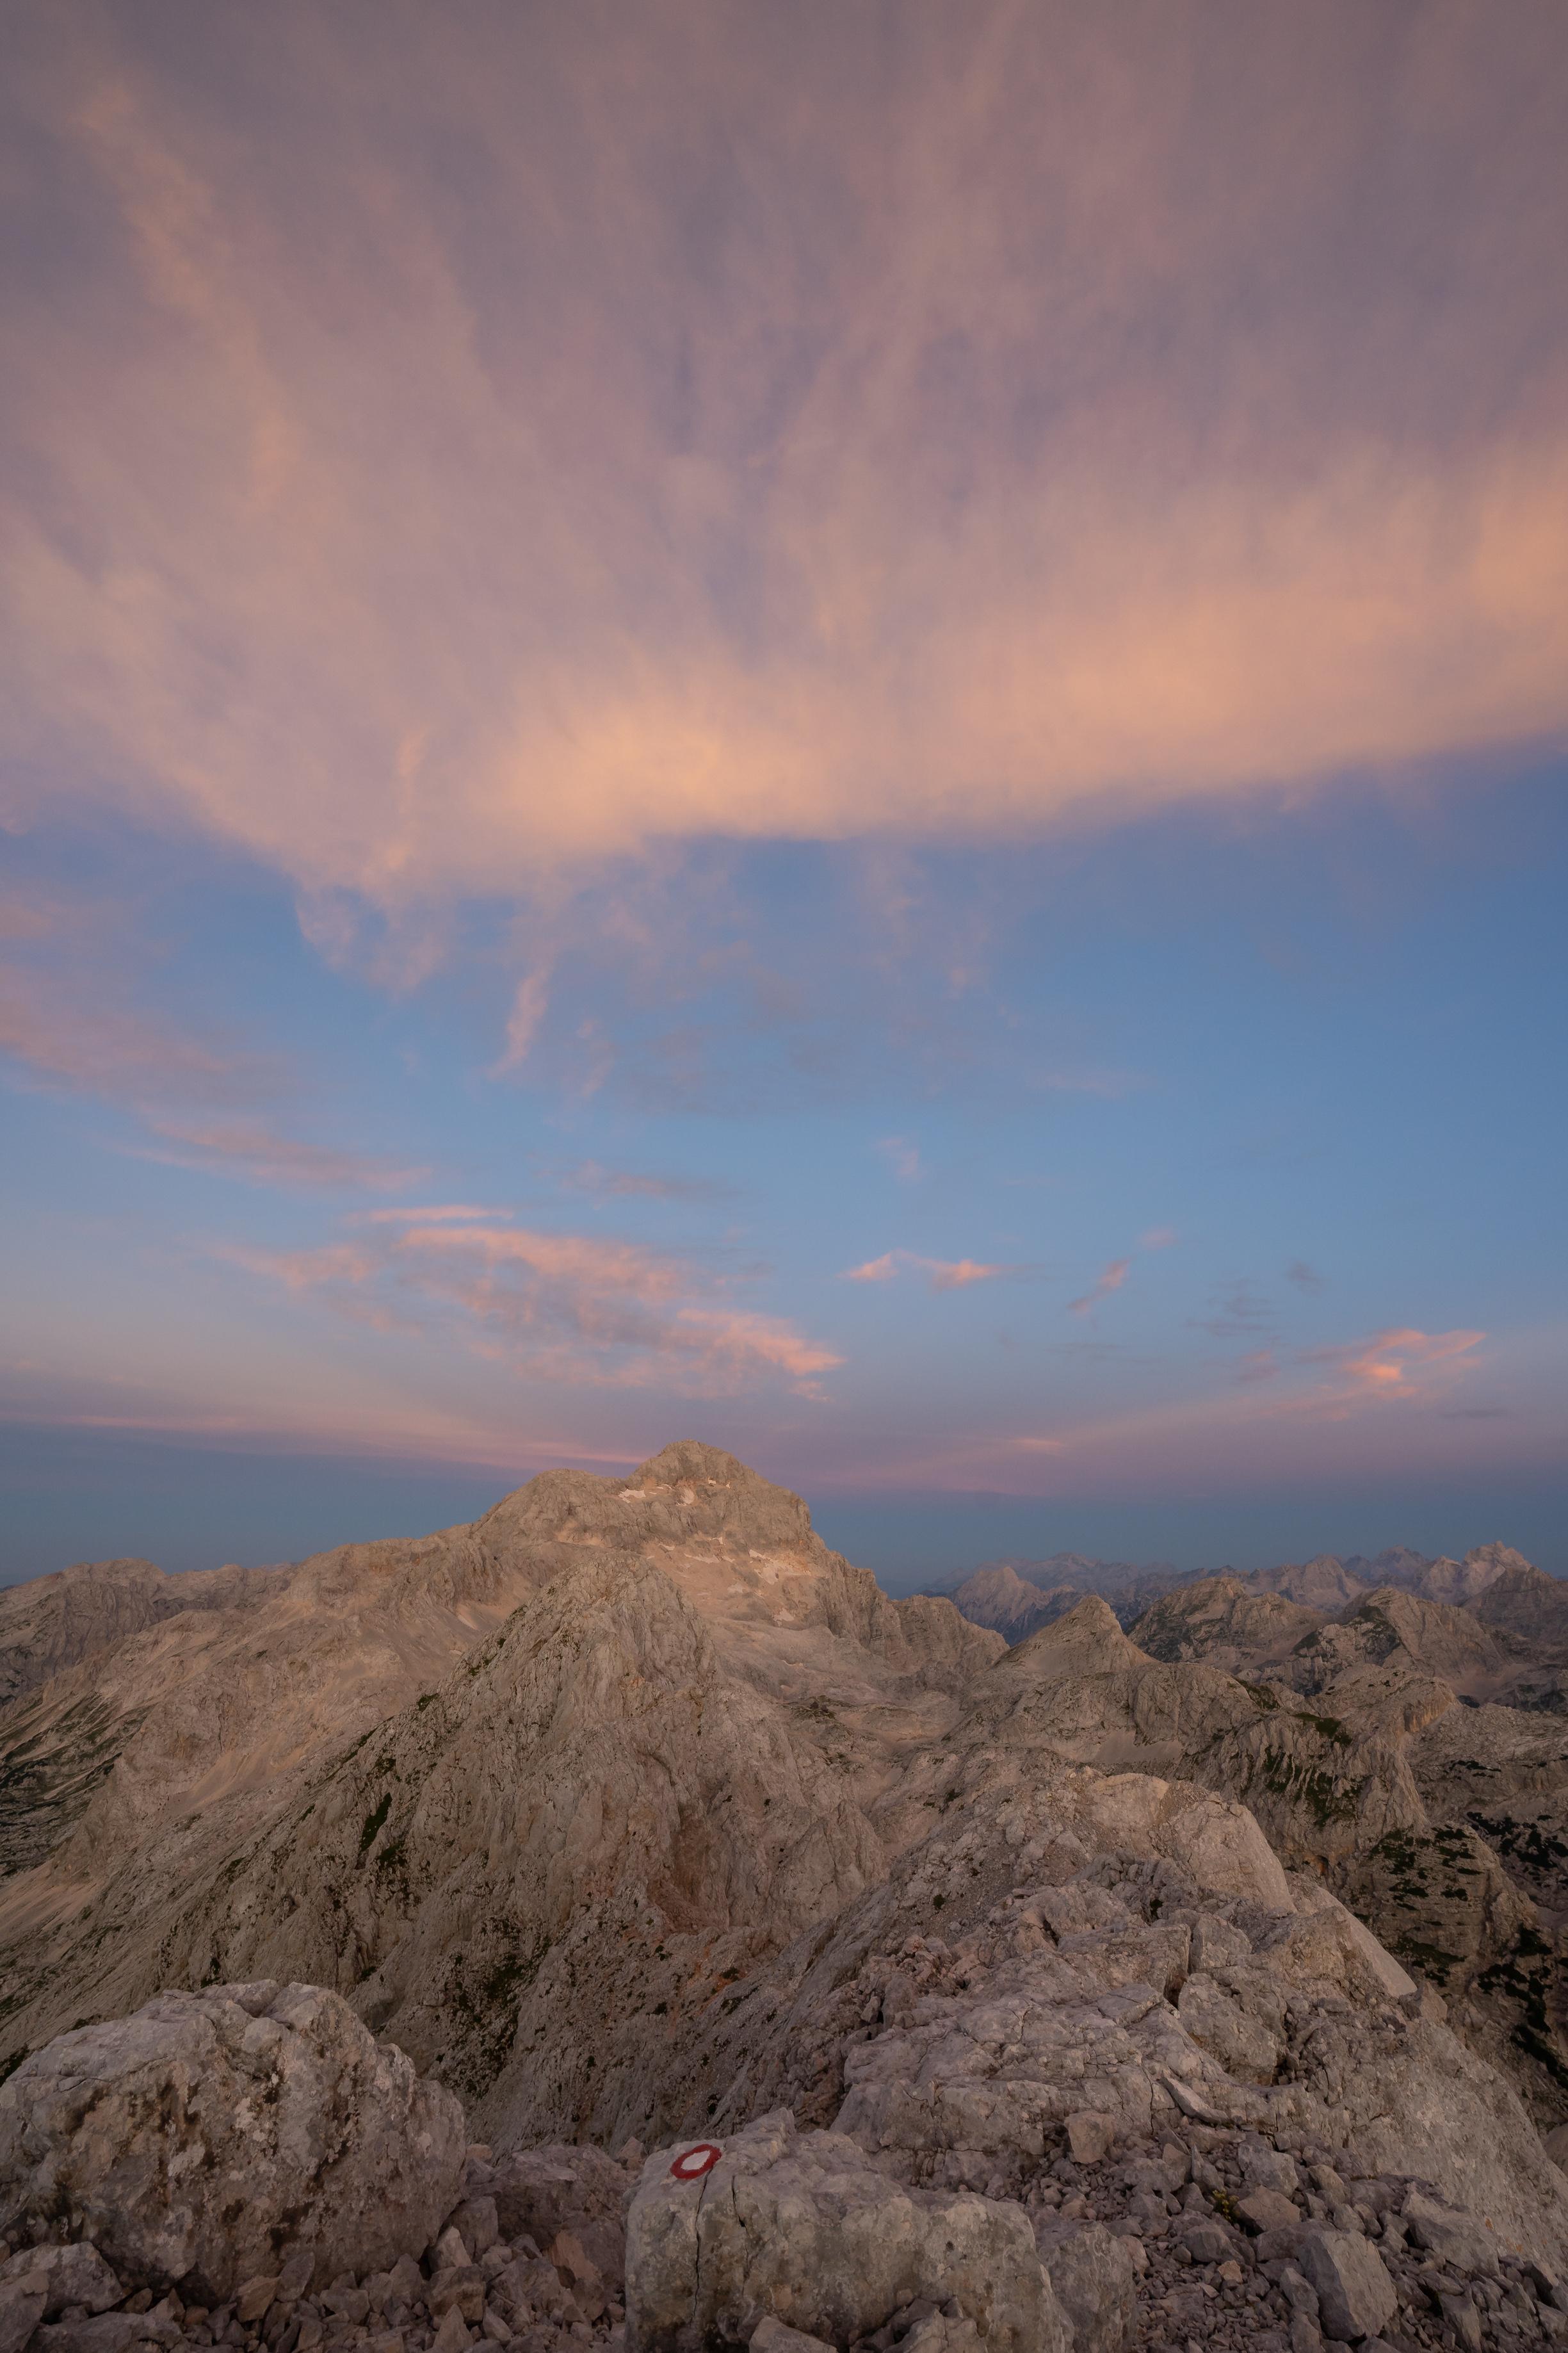 Mt. Triglav from top of Mt. Rjavina.